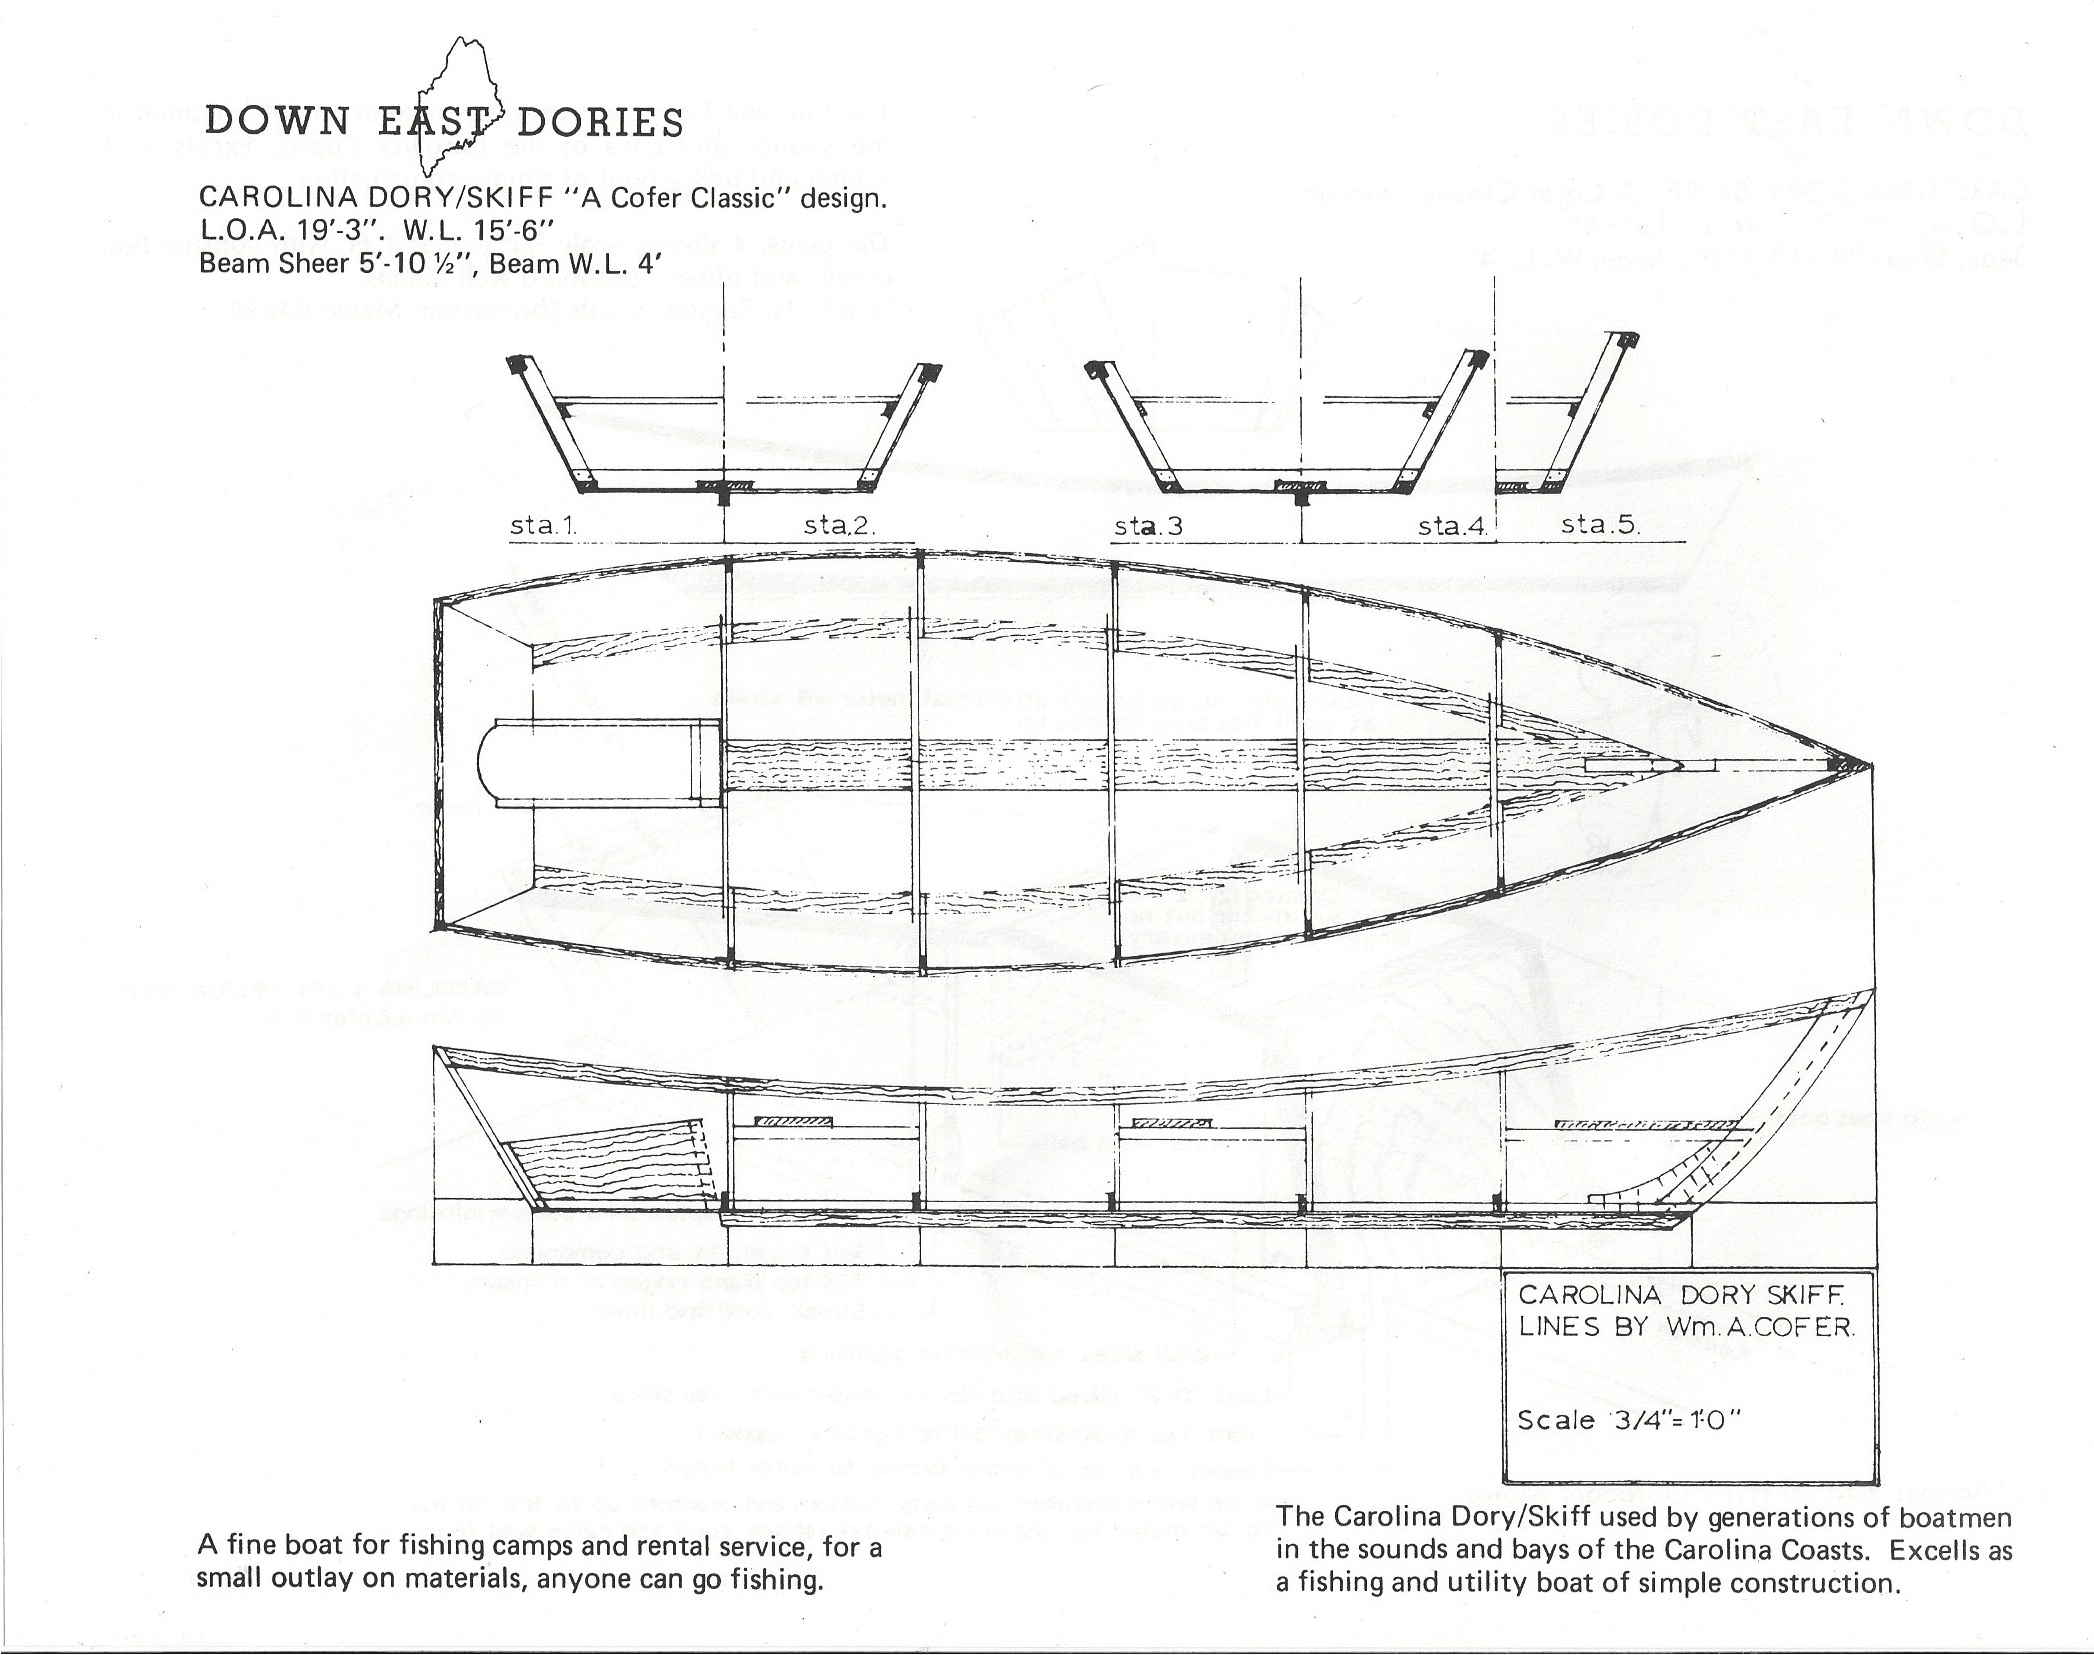 Dynamite Payson Boat Plans : Carolina dory h payson and company